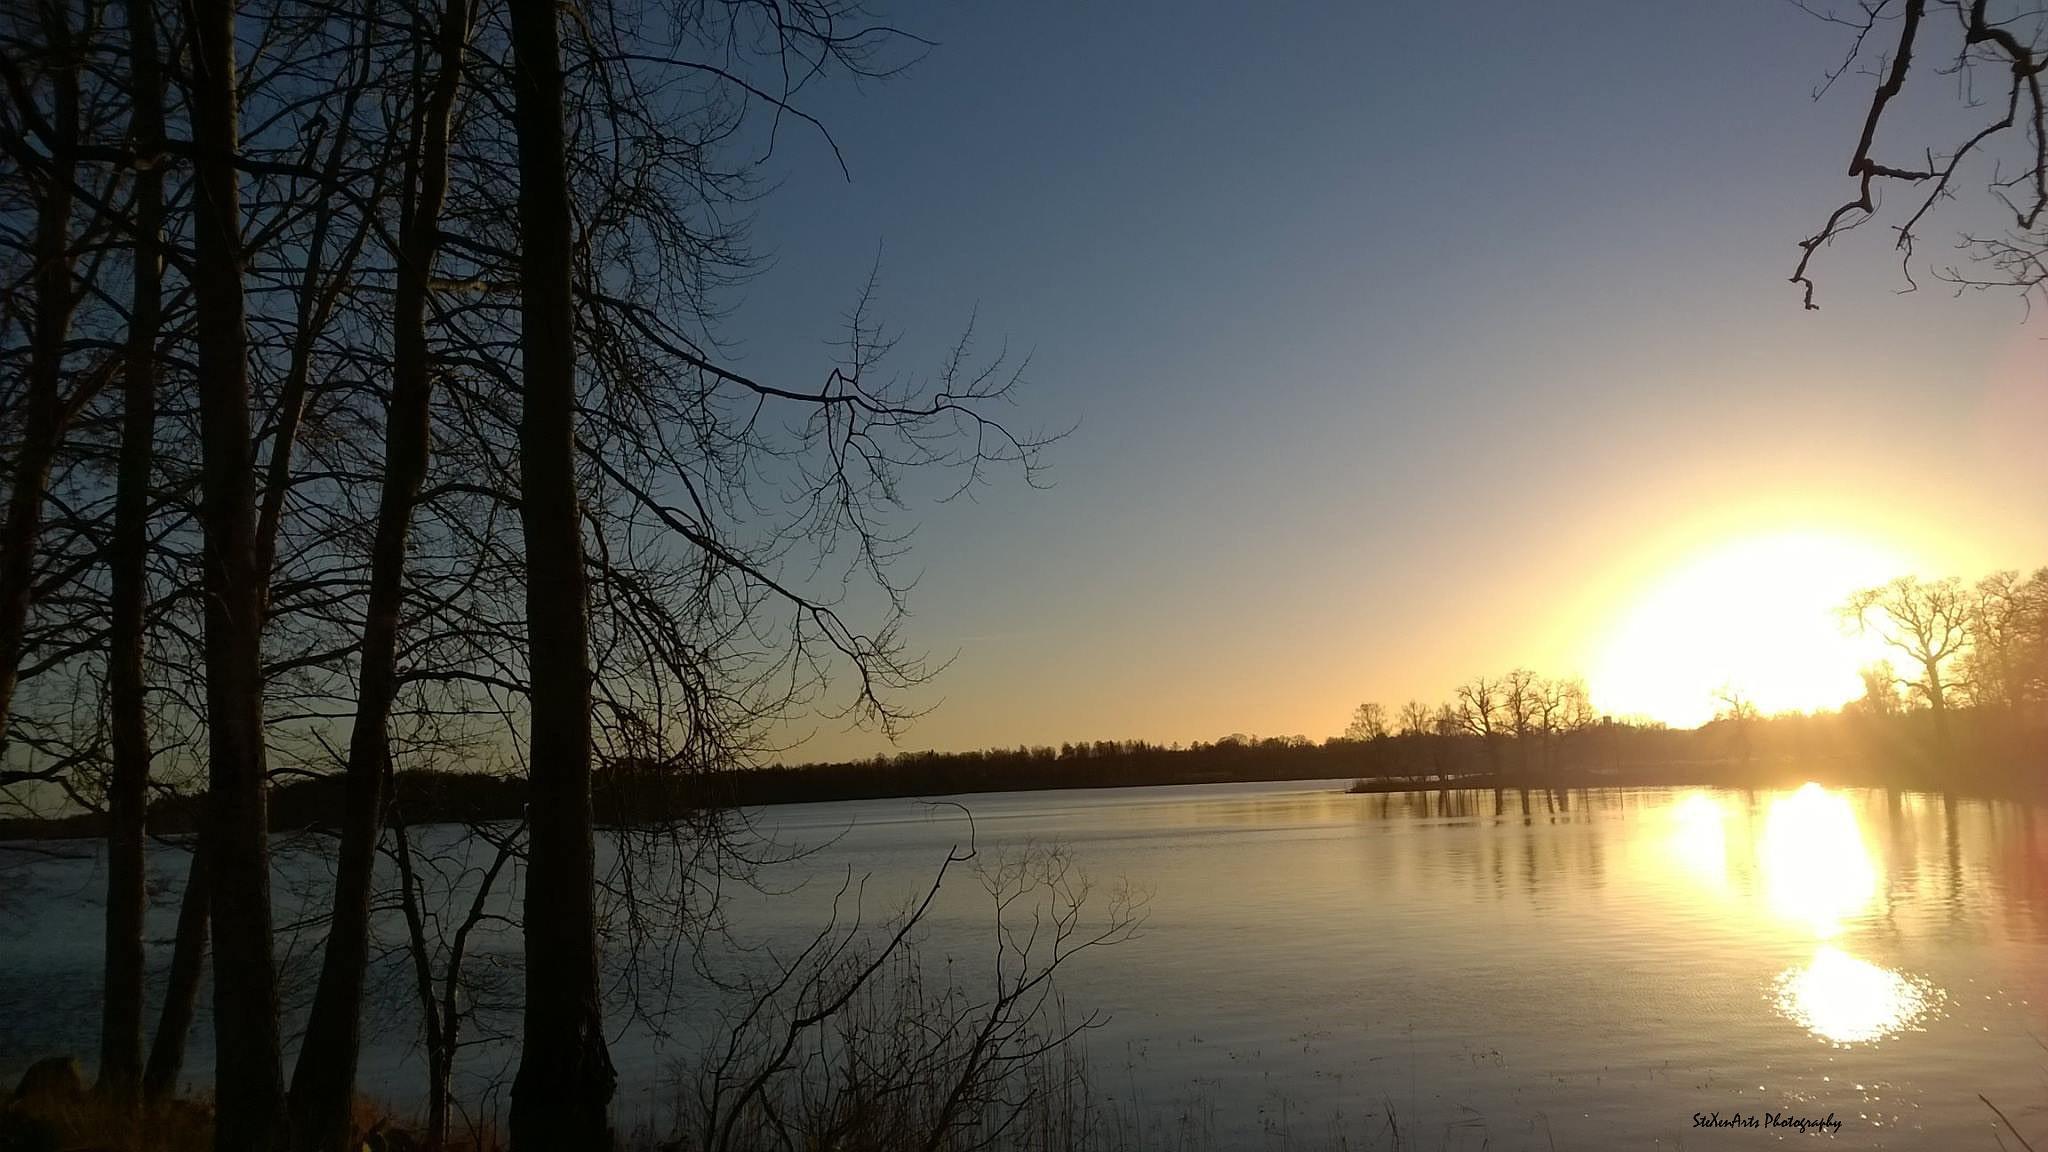 november sunset - take 3 by SteXenArts Photography